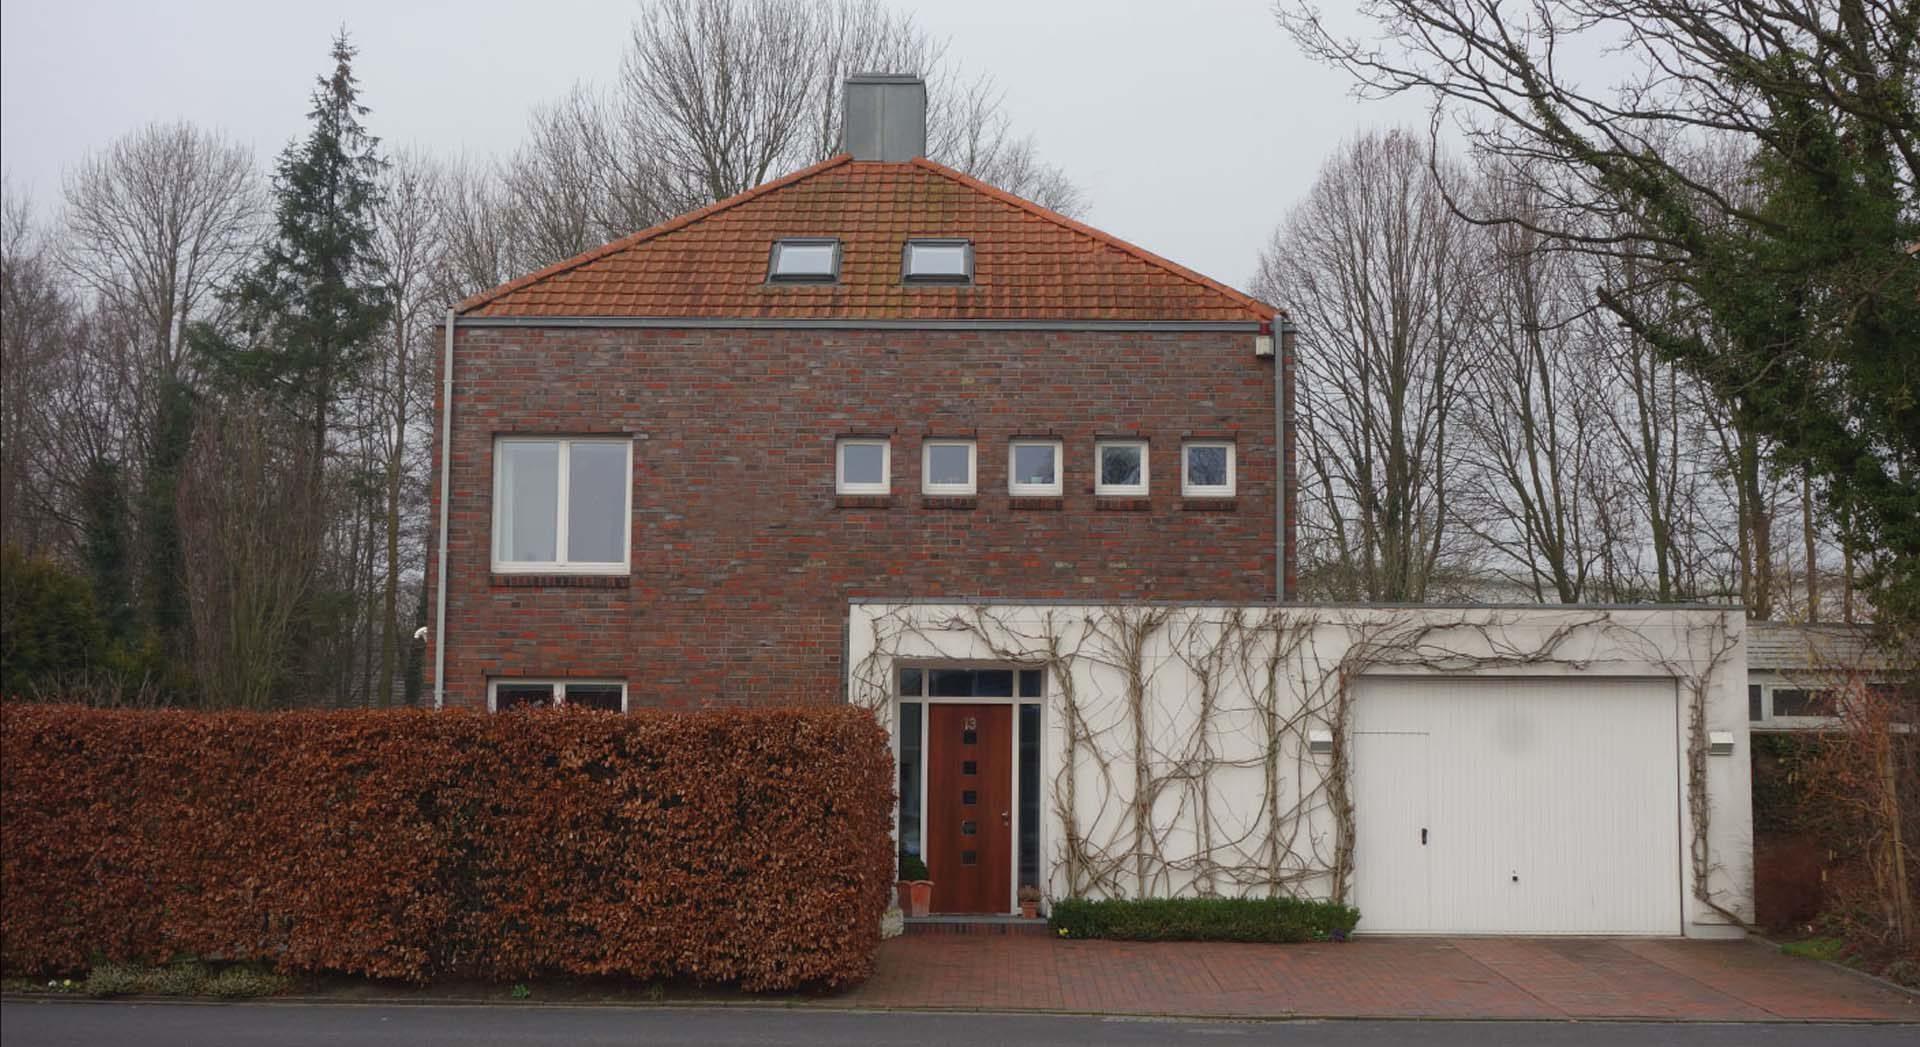 Einfamilienhaus; Architektur; Neubau;